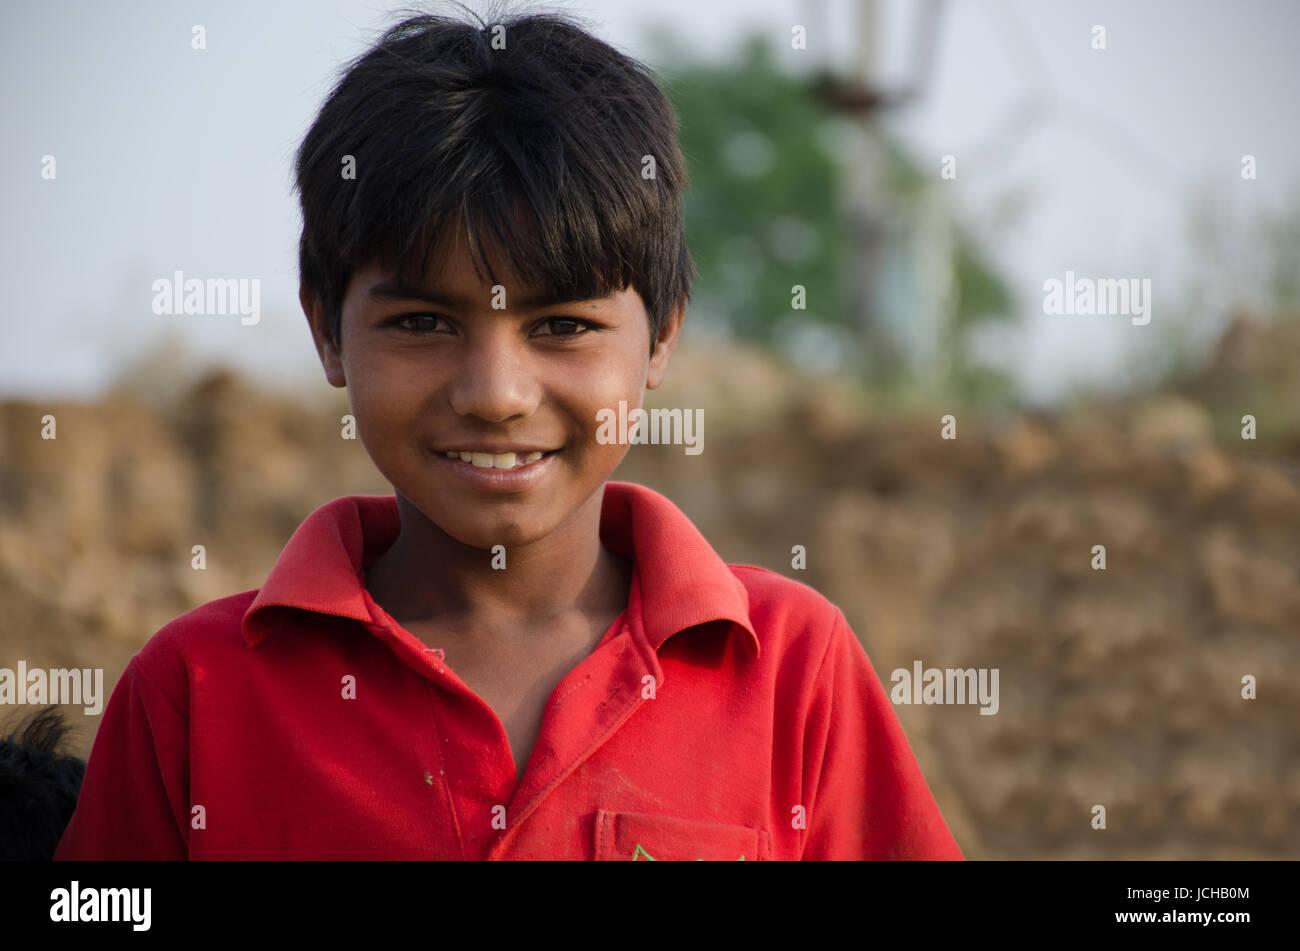 AMRITSAR, PUNJAB, INDIA - 21 APRIL 2017 : portrait of Indian boy smiling - Stock Image